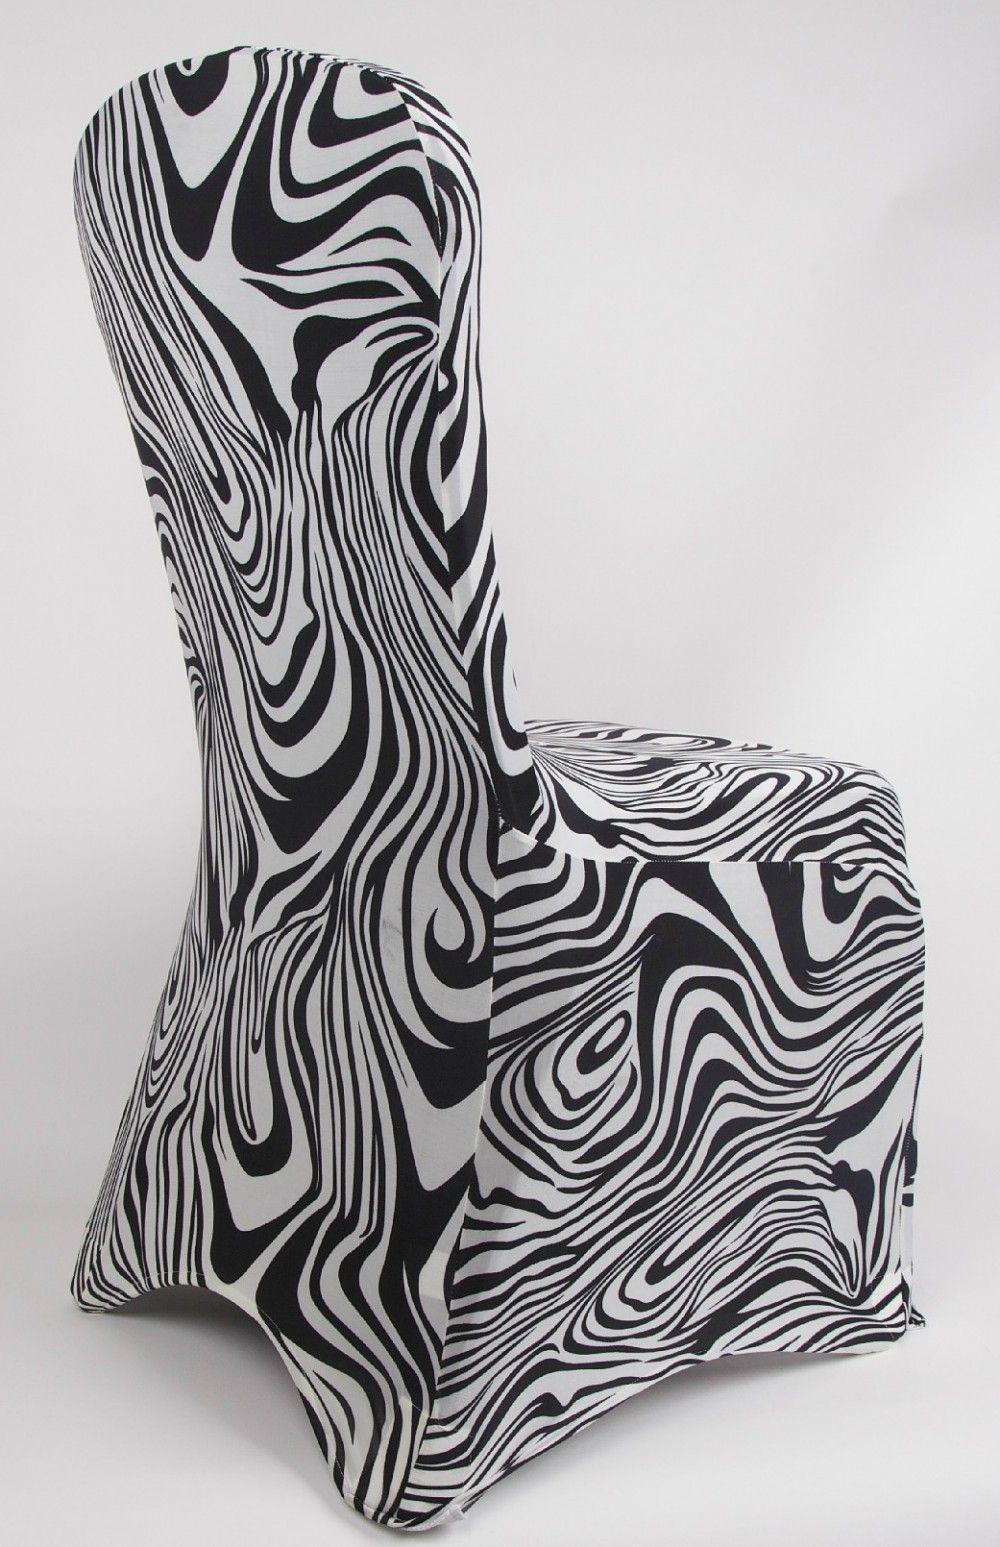 Zebra Print Lycra Chair Covers 1 Animal Print